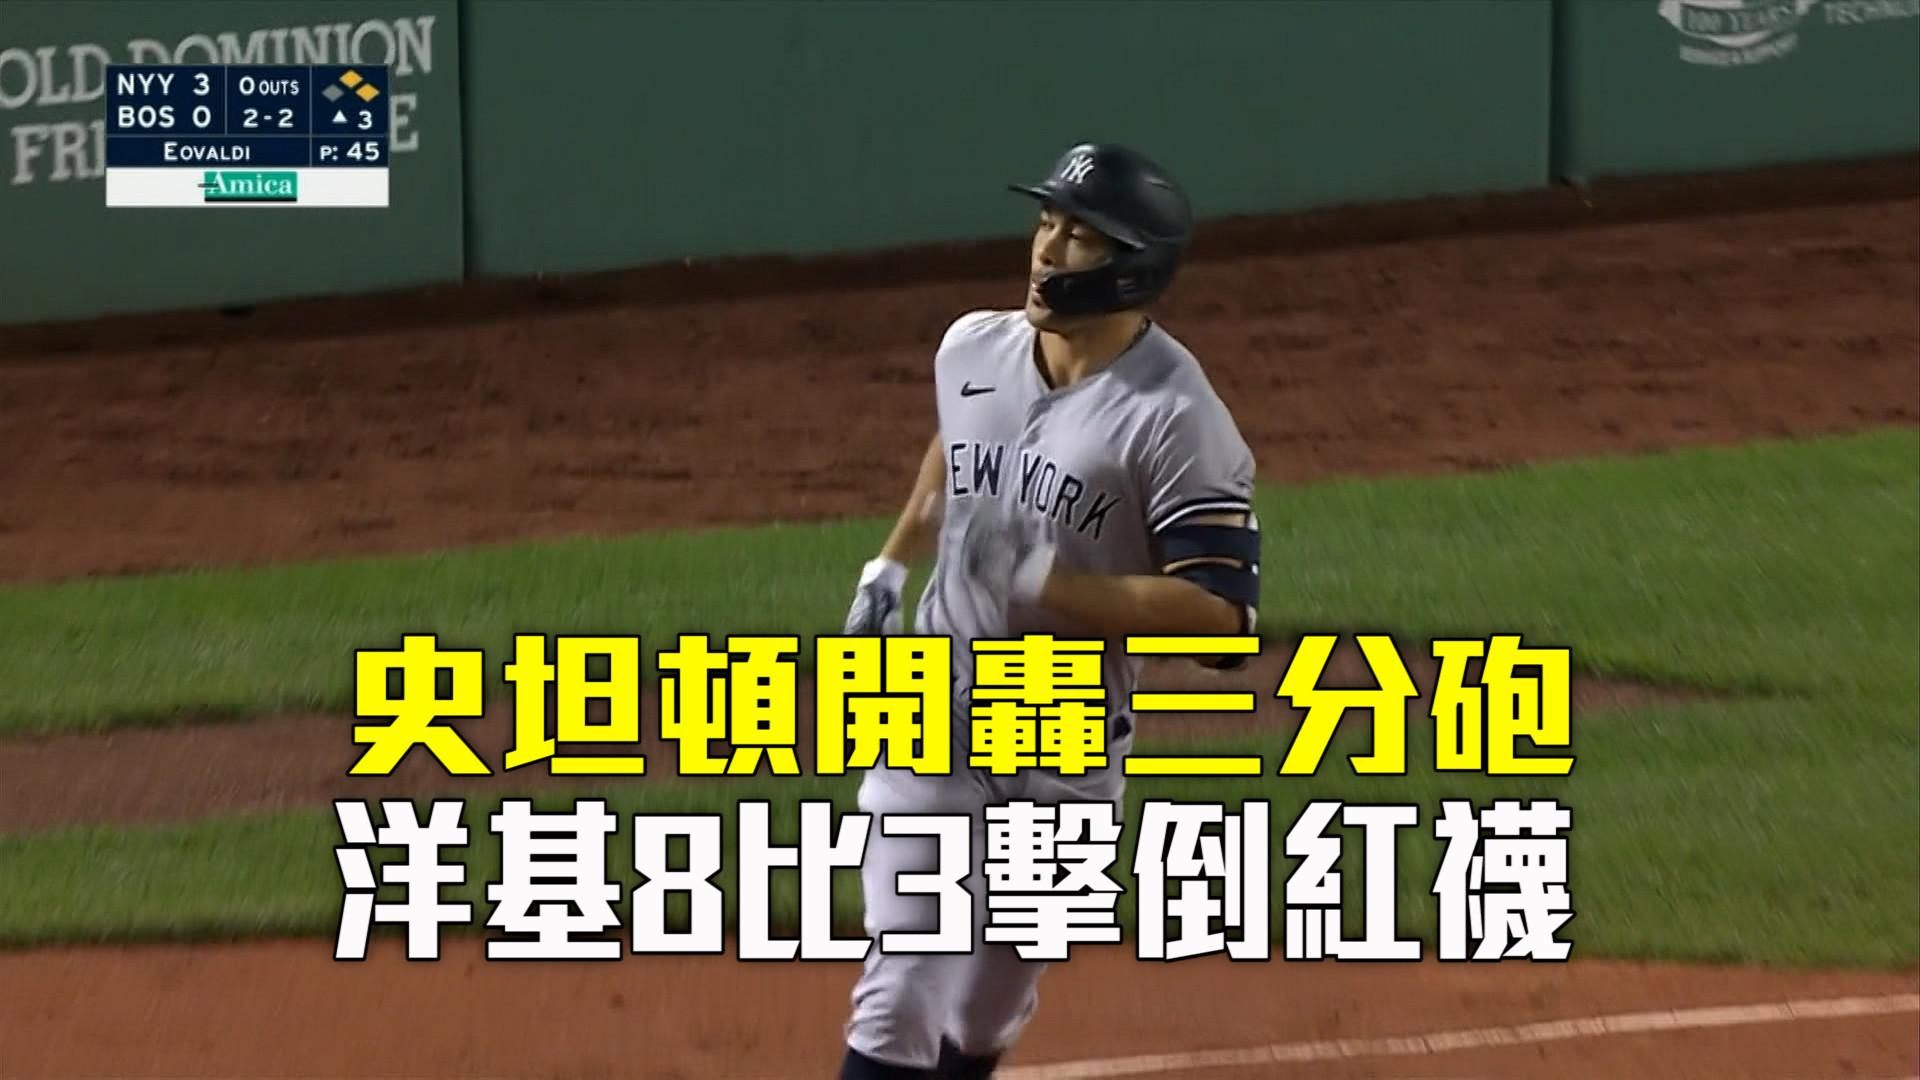 【MLB看愛爾達】史坦頓開轟三分砲 洋基8比3擊倒紅襪 9/25